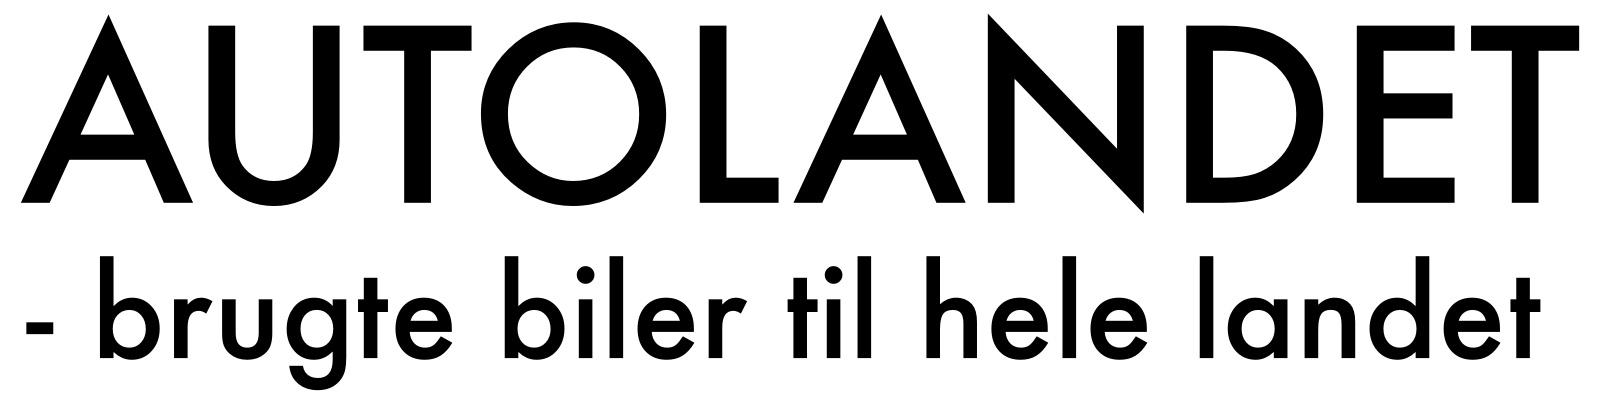 AUTOLANDET ApS logo